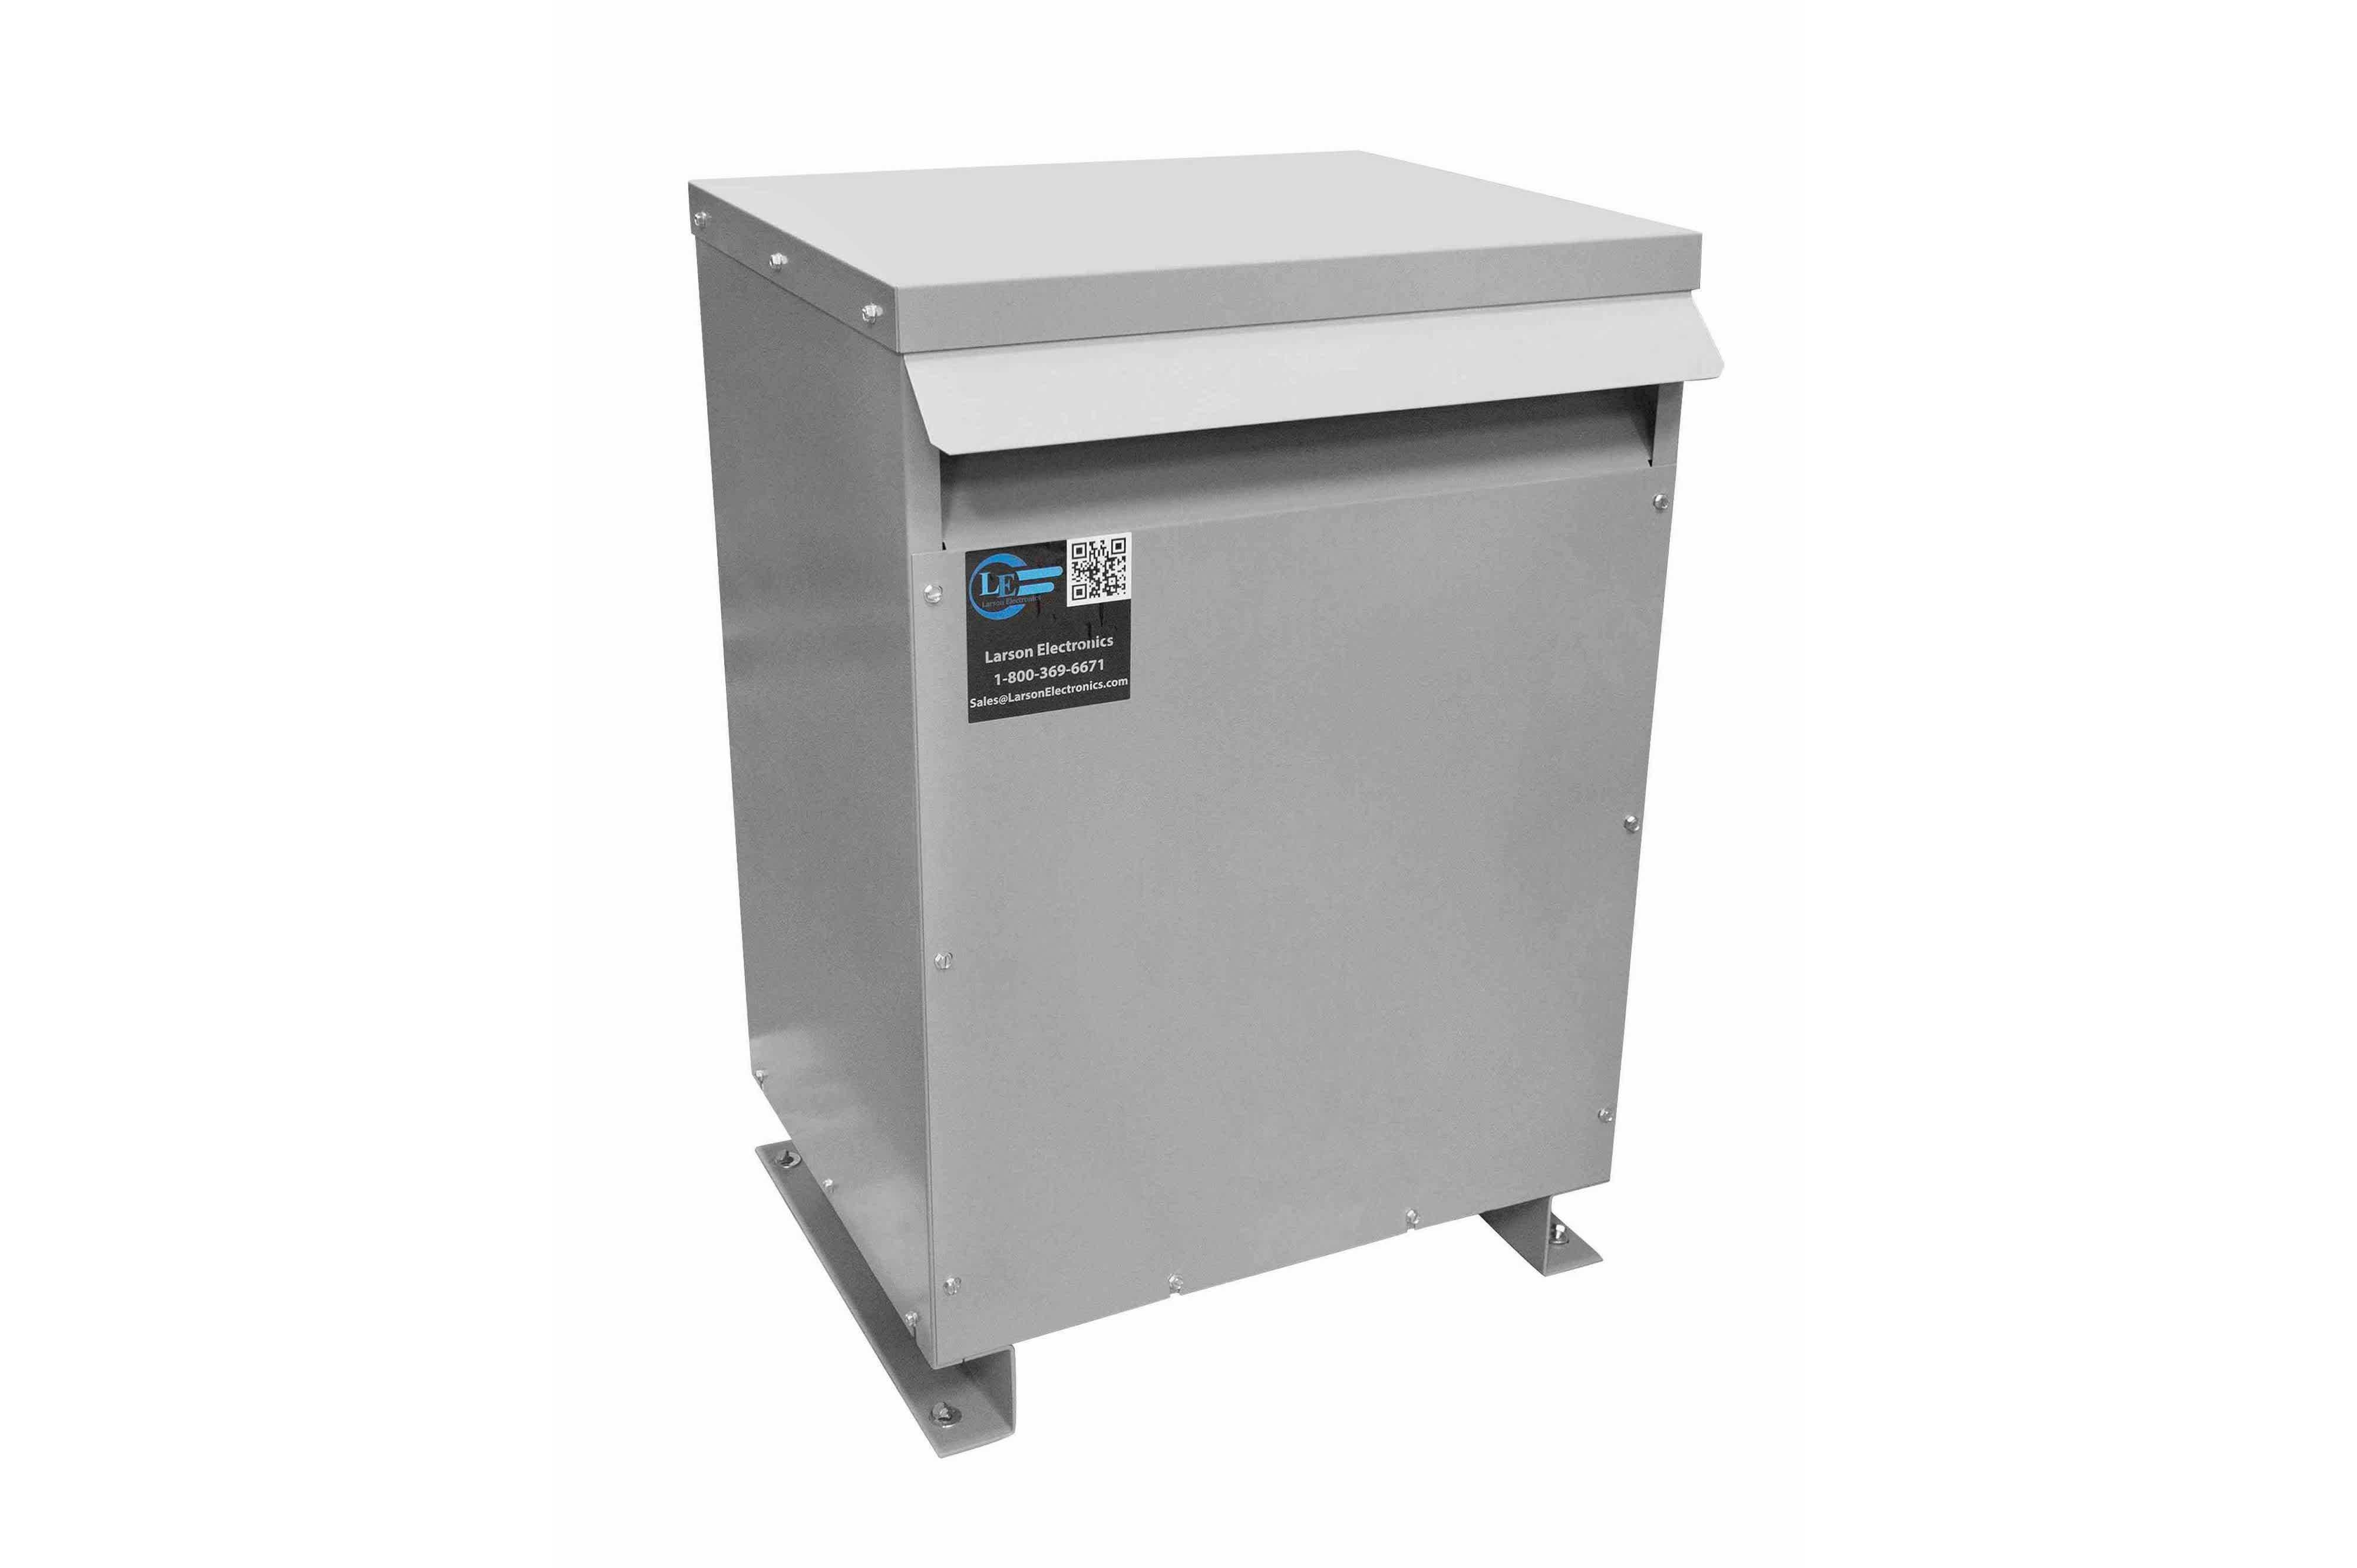 11 kVA 3PH Isolation Transformer, 480V Wye Primary, 415Y/240 Wye-N Secondary, N3R, Ventilated, 60 Hz